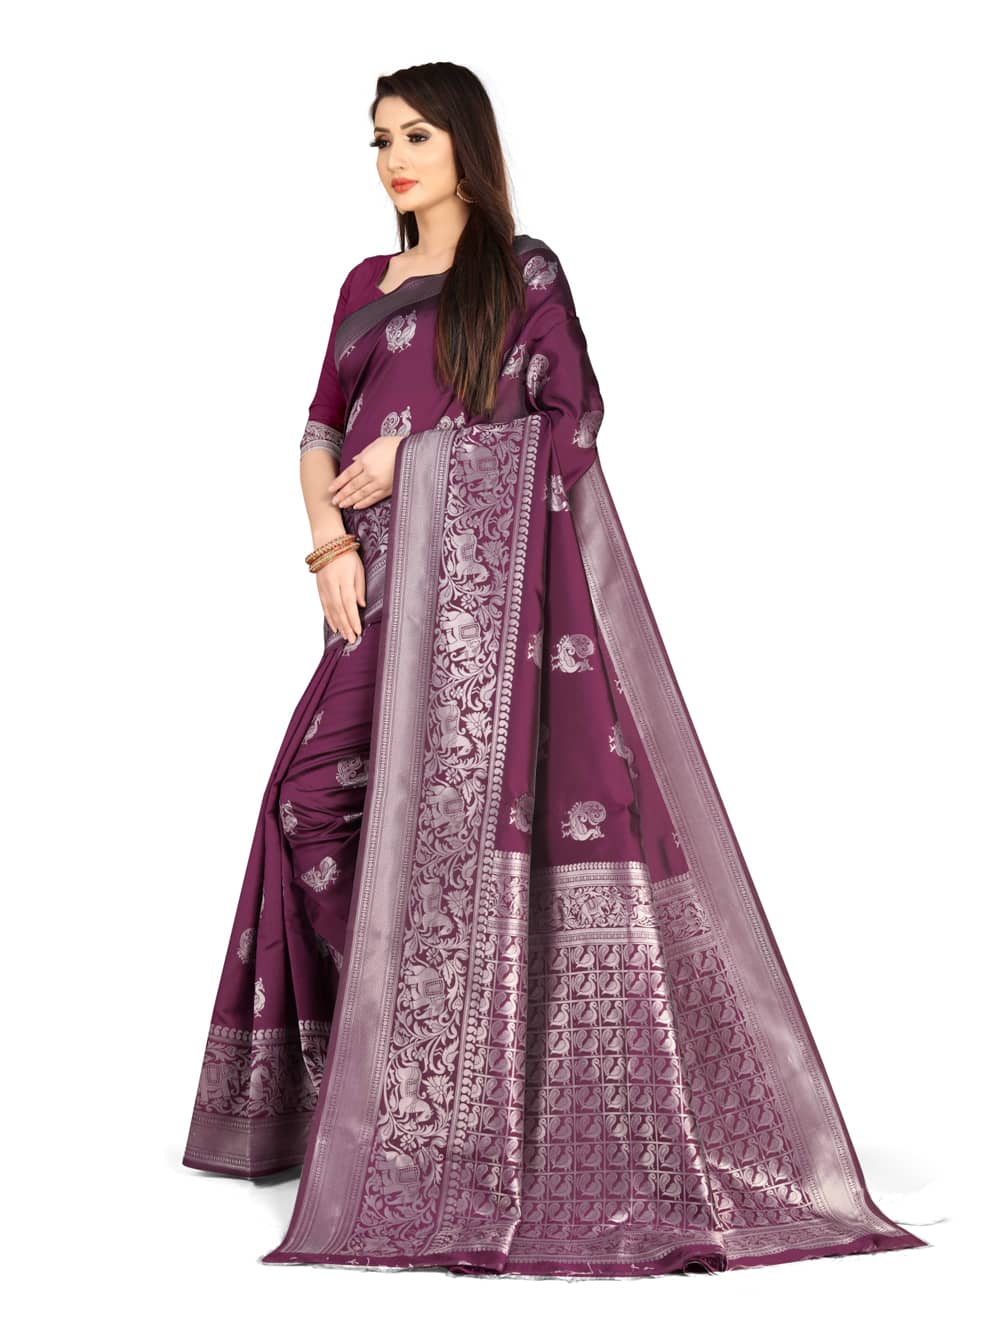 Soft banarsari Silk Saree With weaving work saree with heavy Pallu (Magenta) dvz0001406